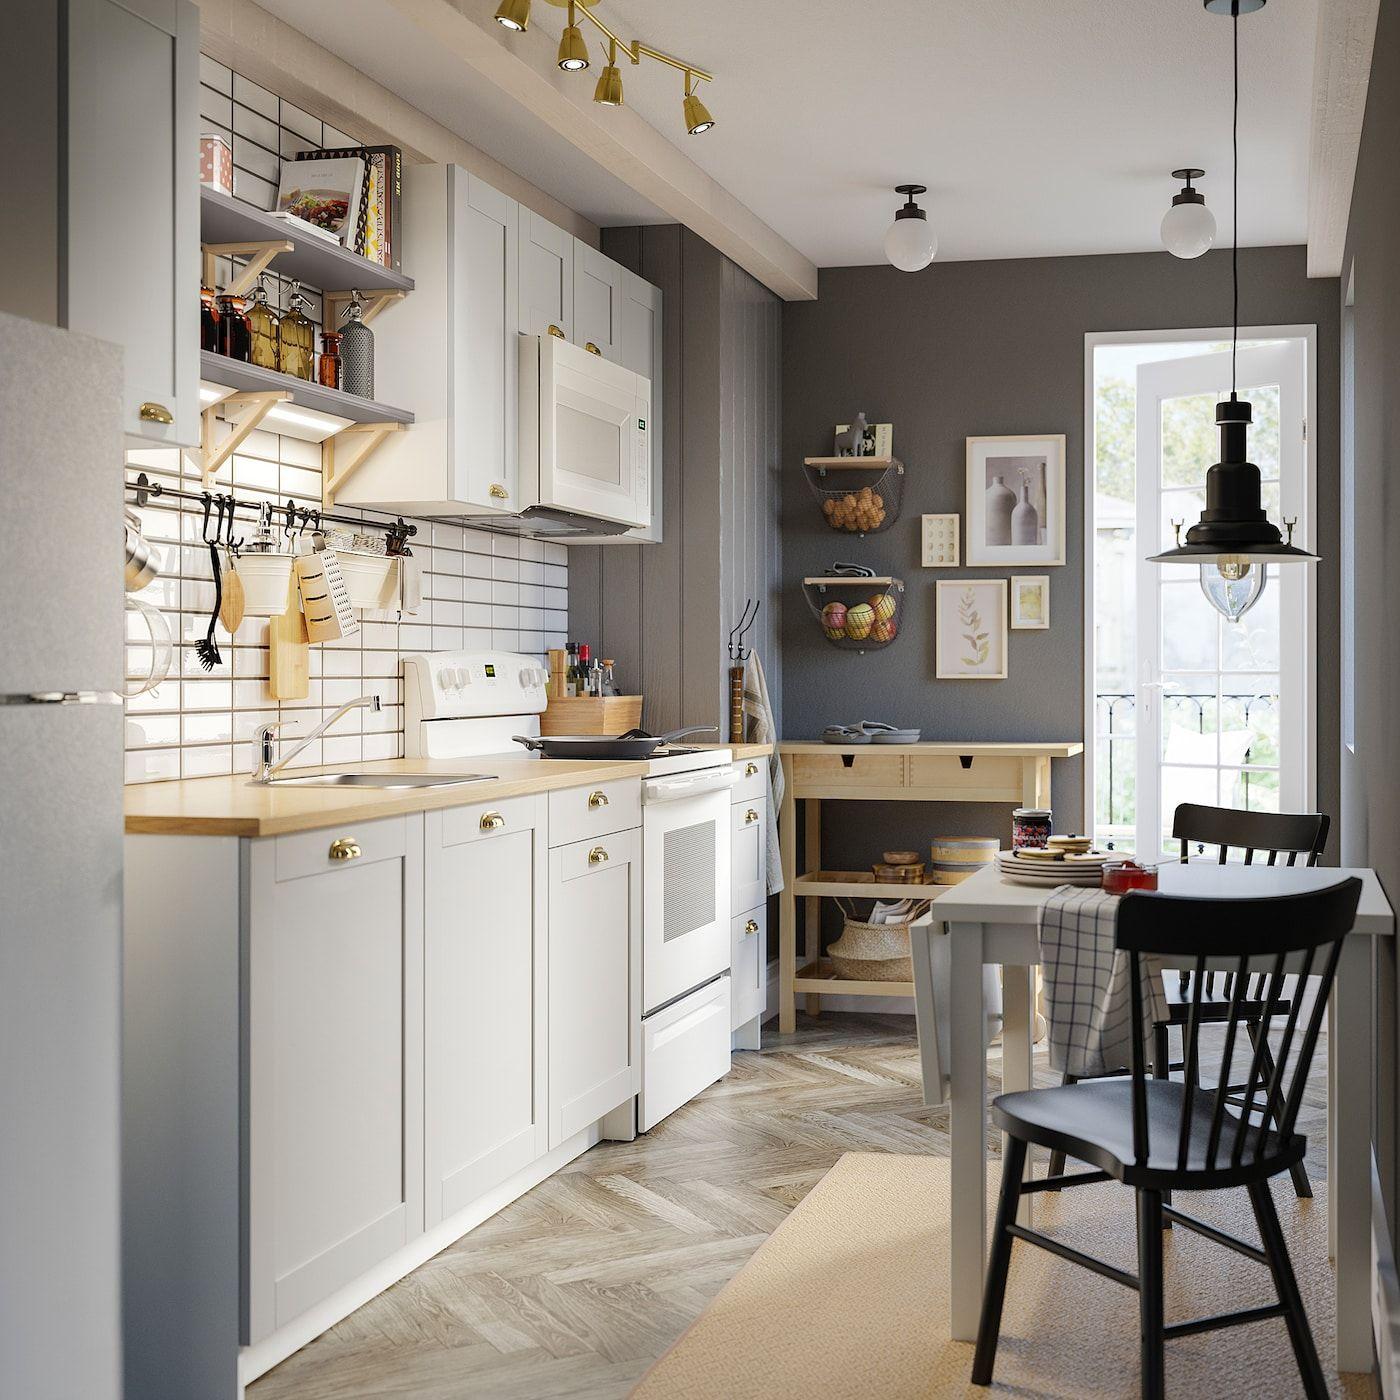 IKEA   KNOXHULT Kitchen gray   Идеи икеа, Кухня ikea, Интерьер